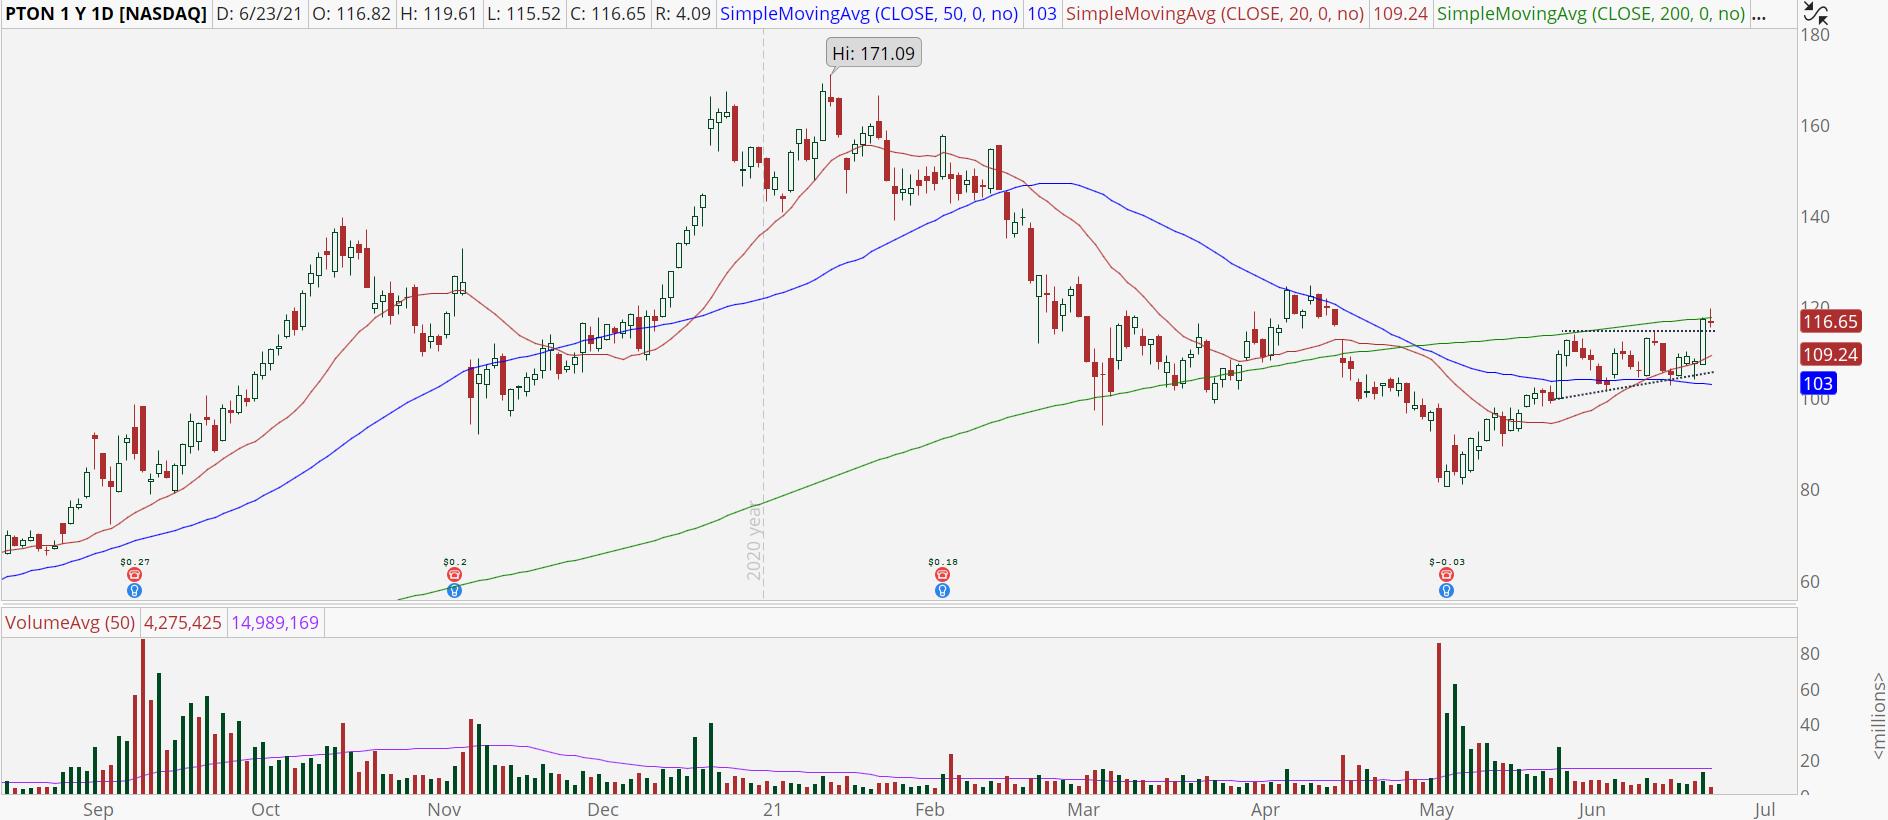 Peloton (PTON) stock chart with bullish breakout